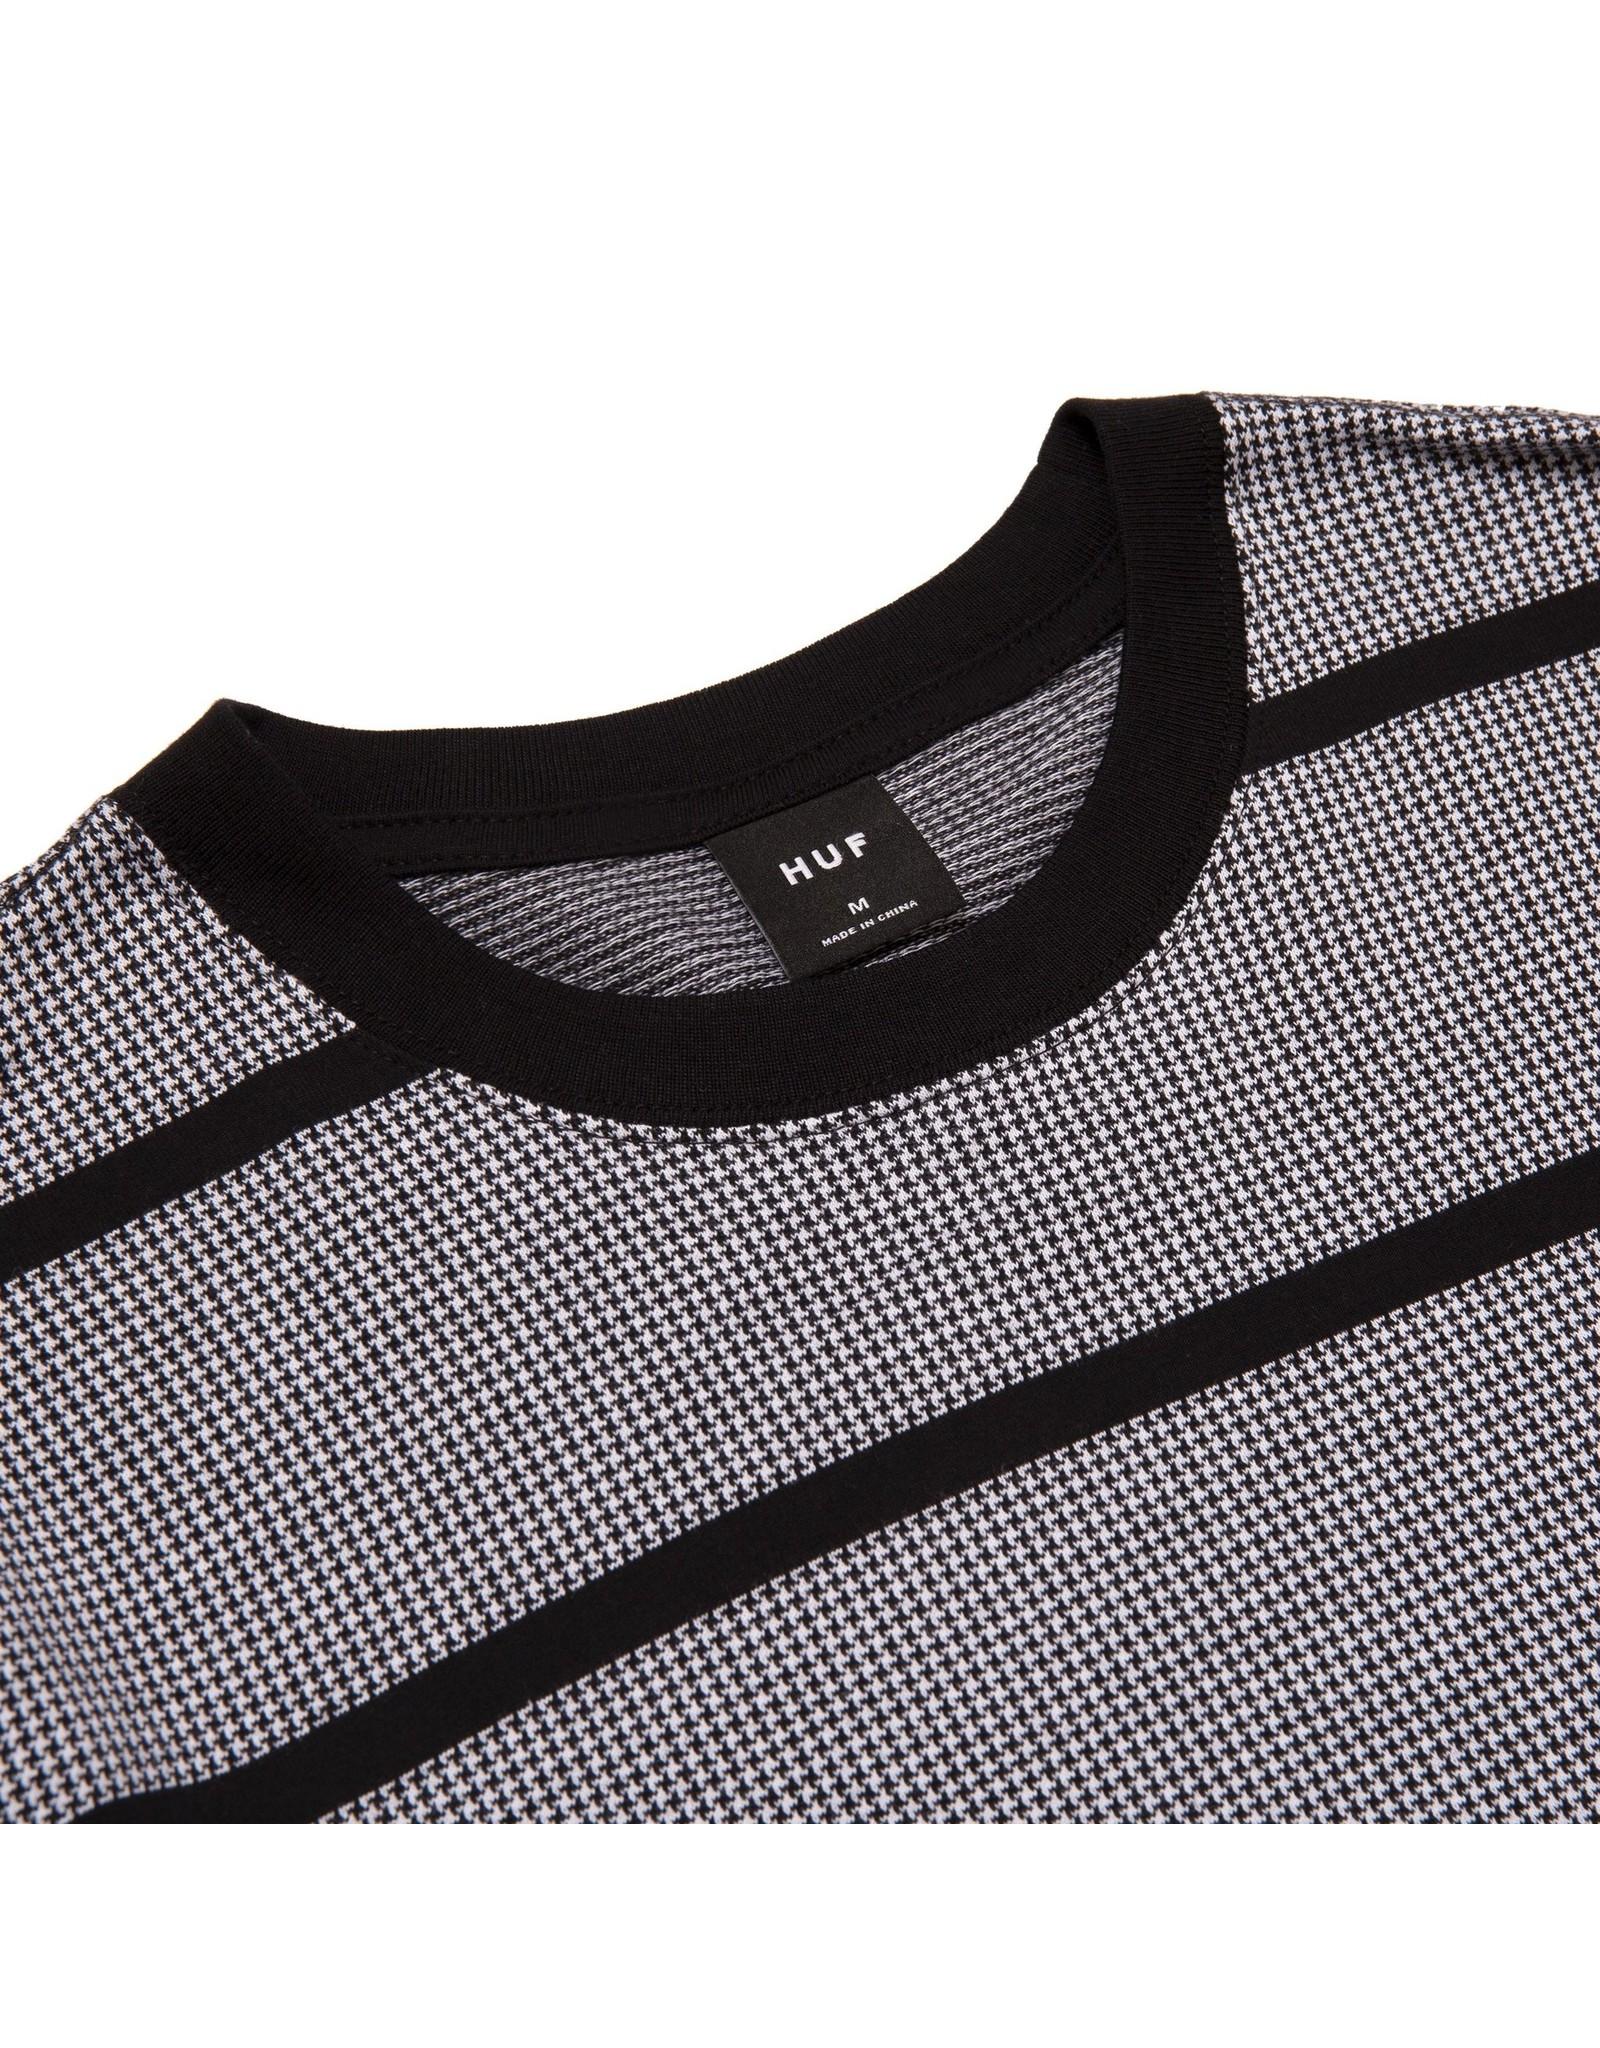 HUF Houndstooth Stripe L/S Knit - Black